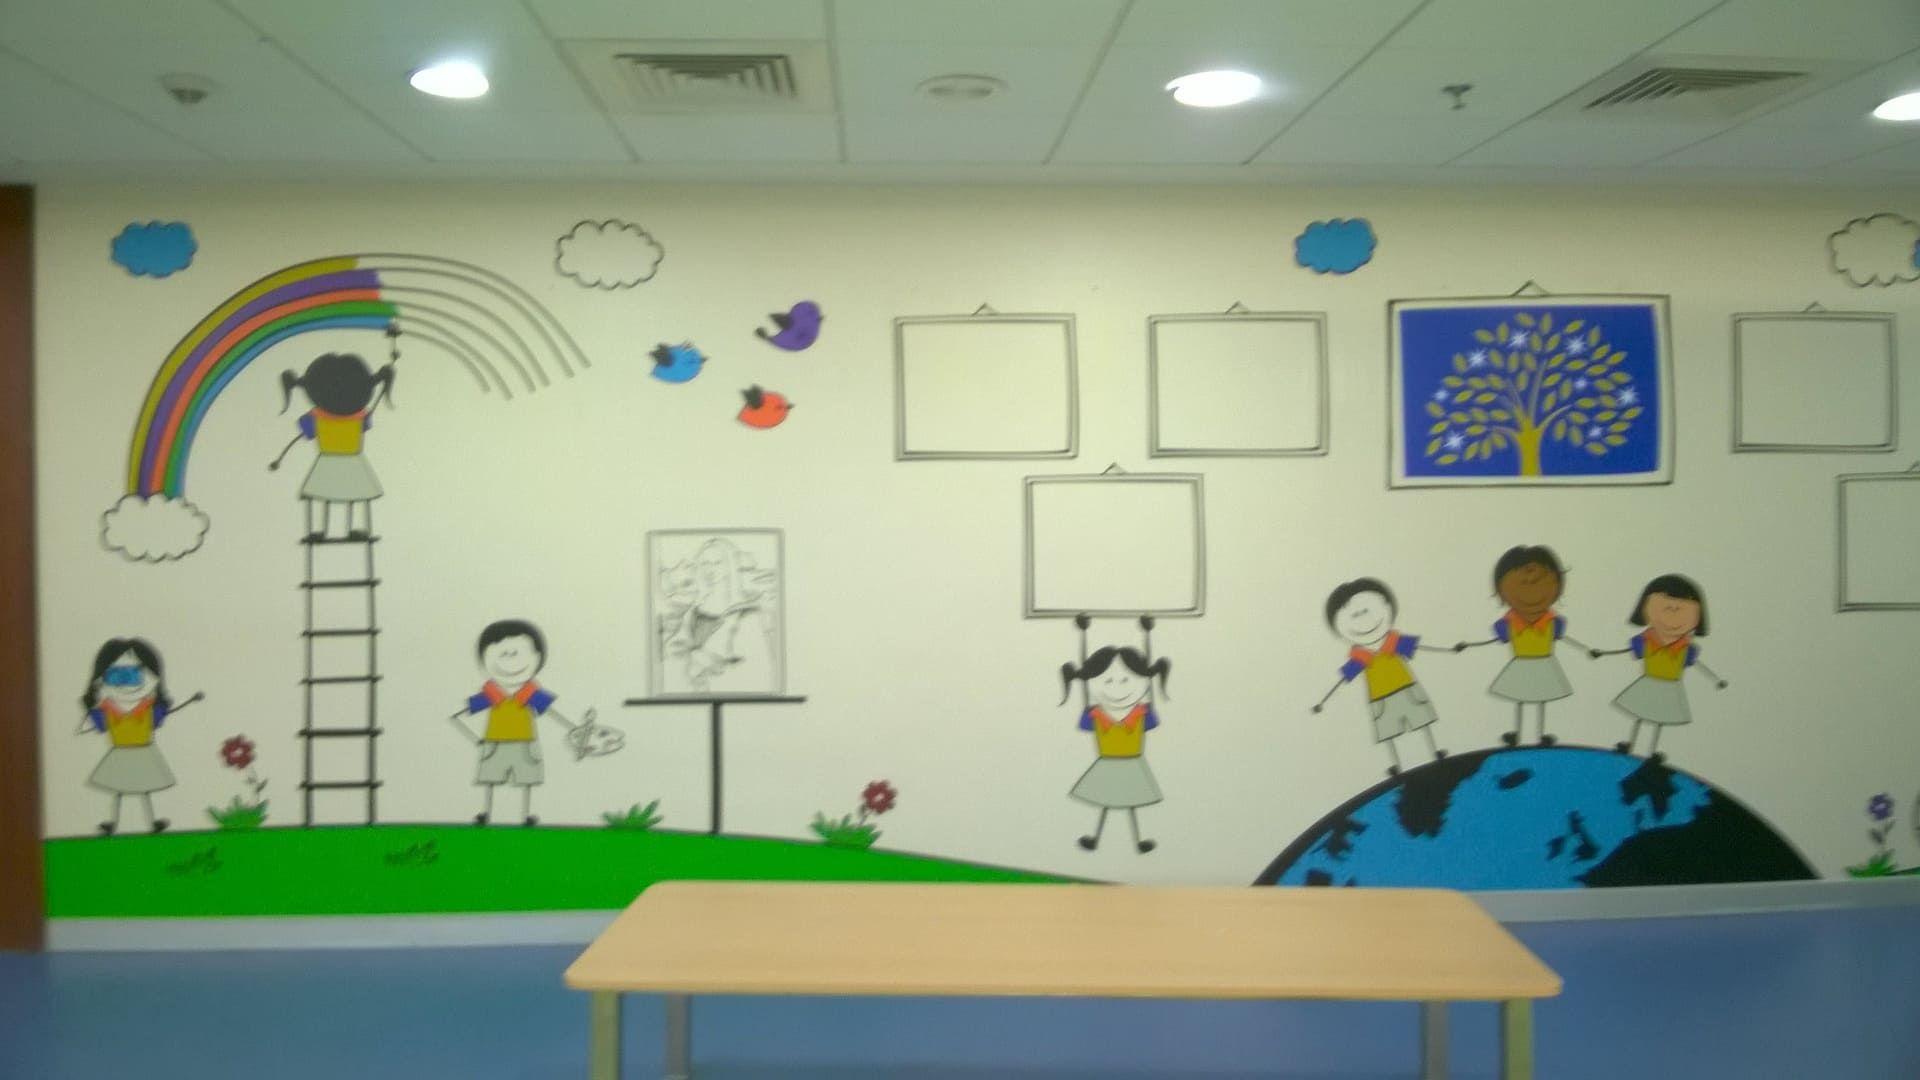 Mockingbird Studios Mumbai Customized Wall Graphics Decals Wallpapers Canvas Schools 8 School Graphic Wall Graphics